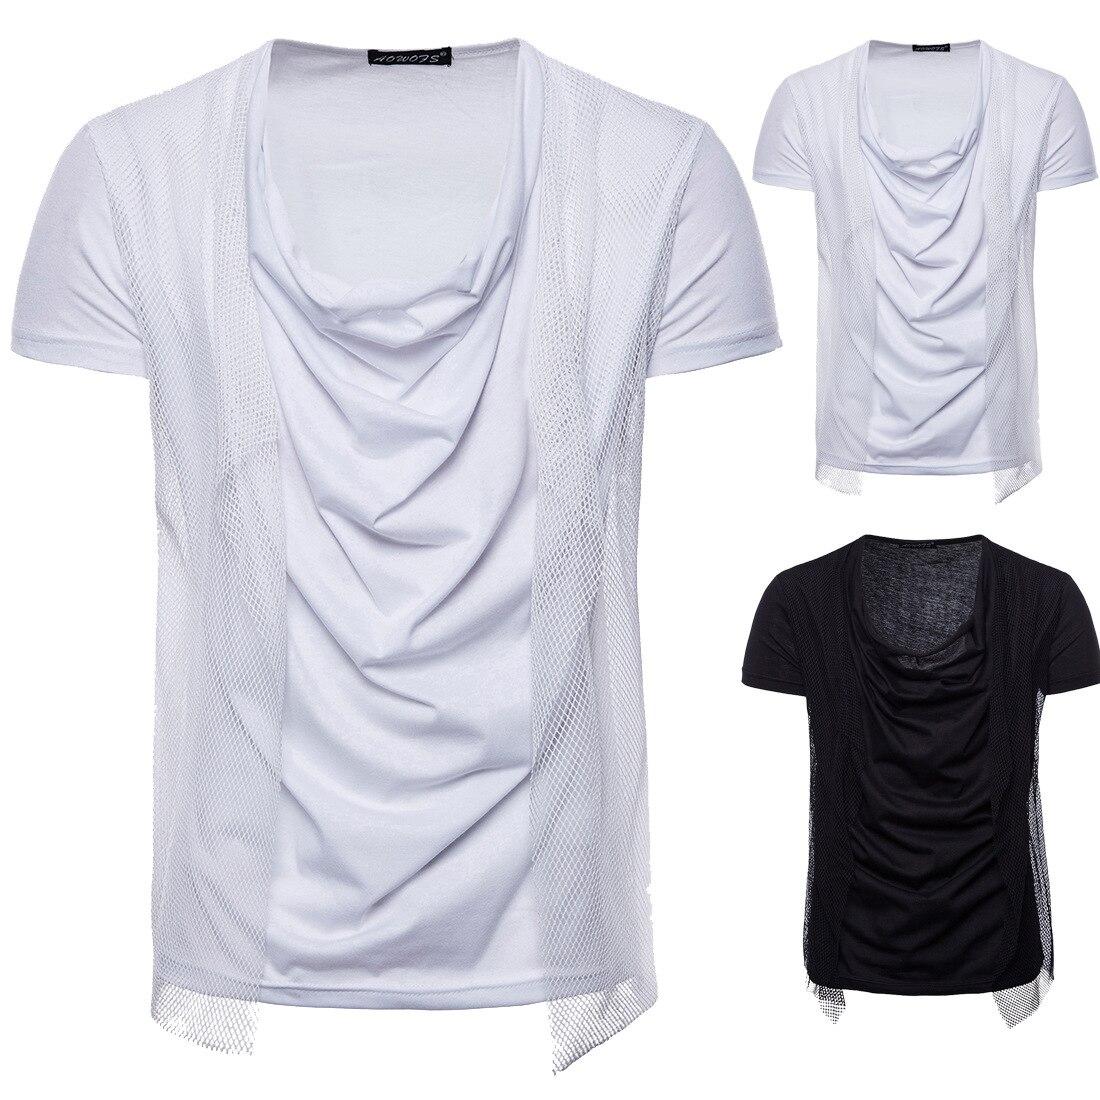 T- shirt yt 002 ...